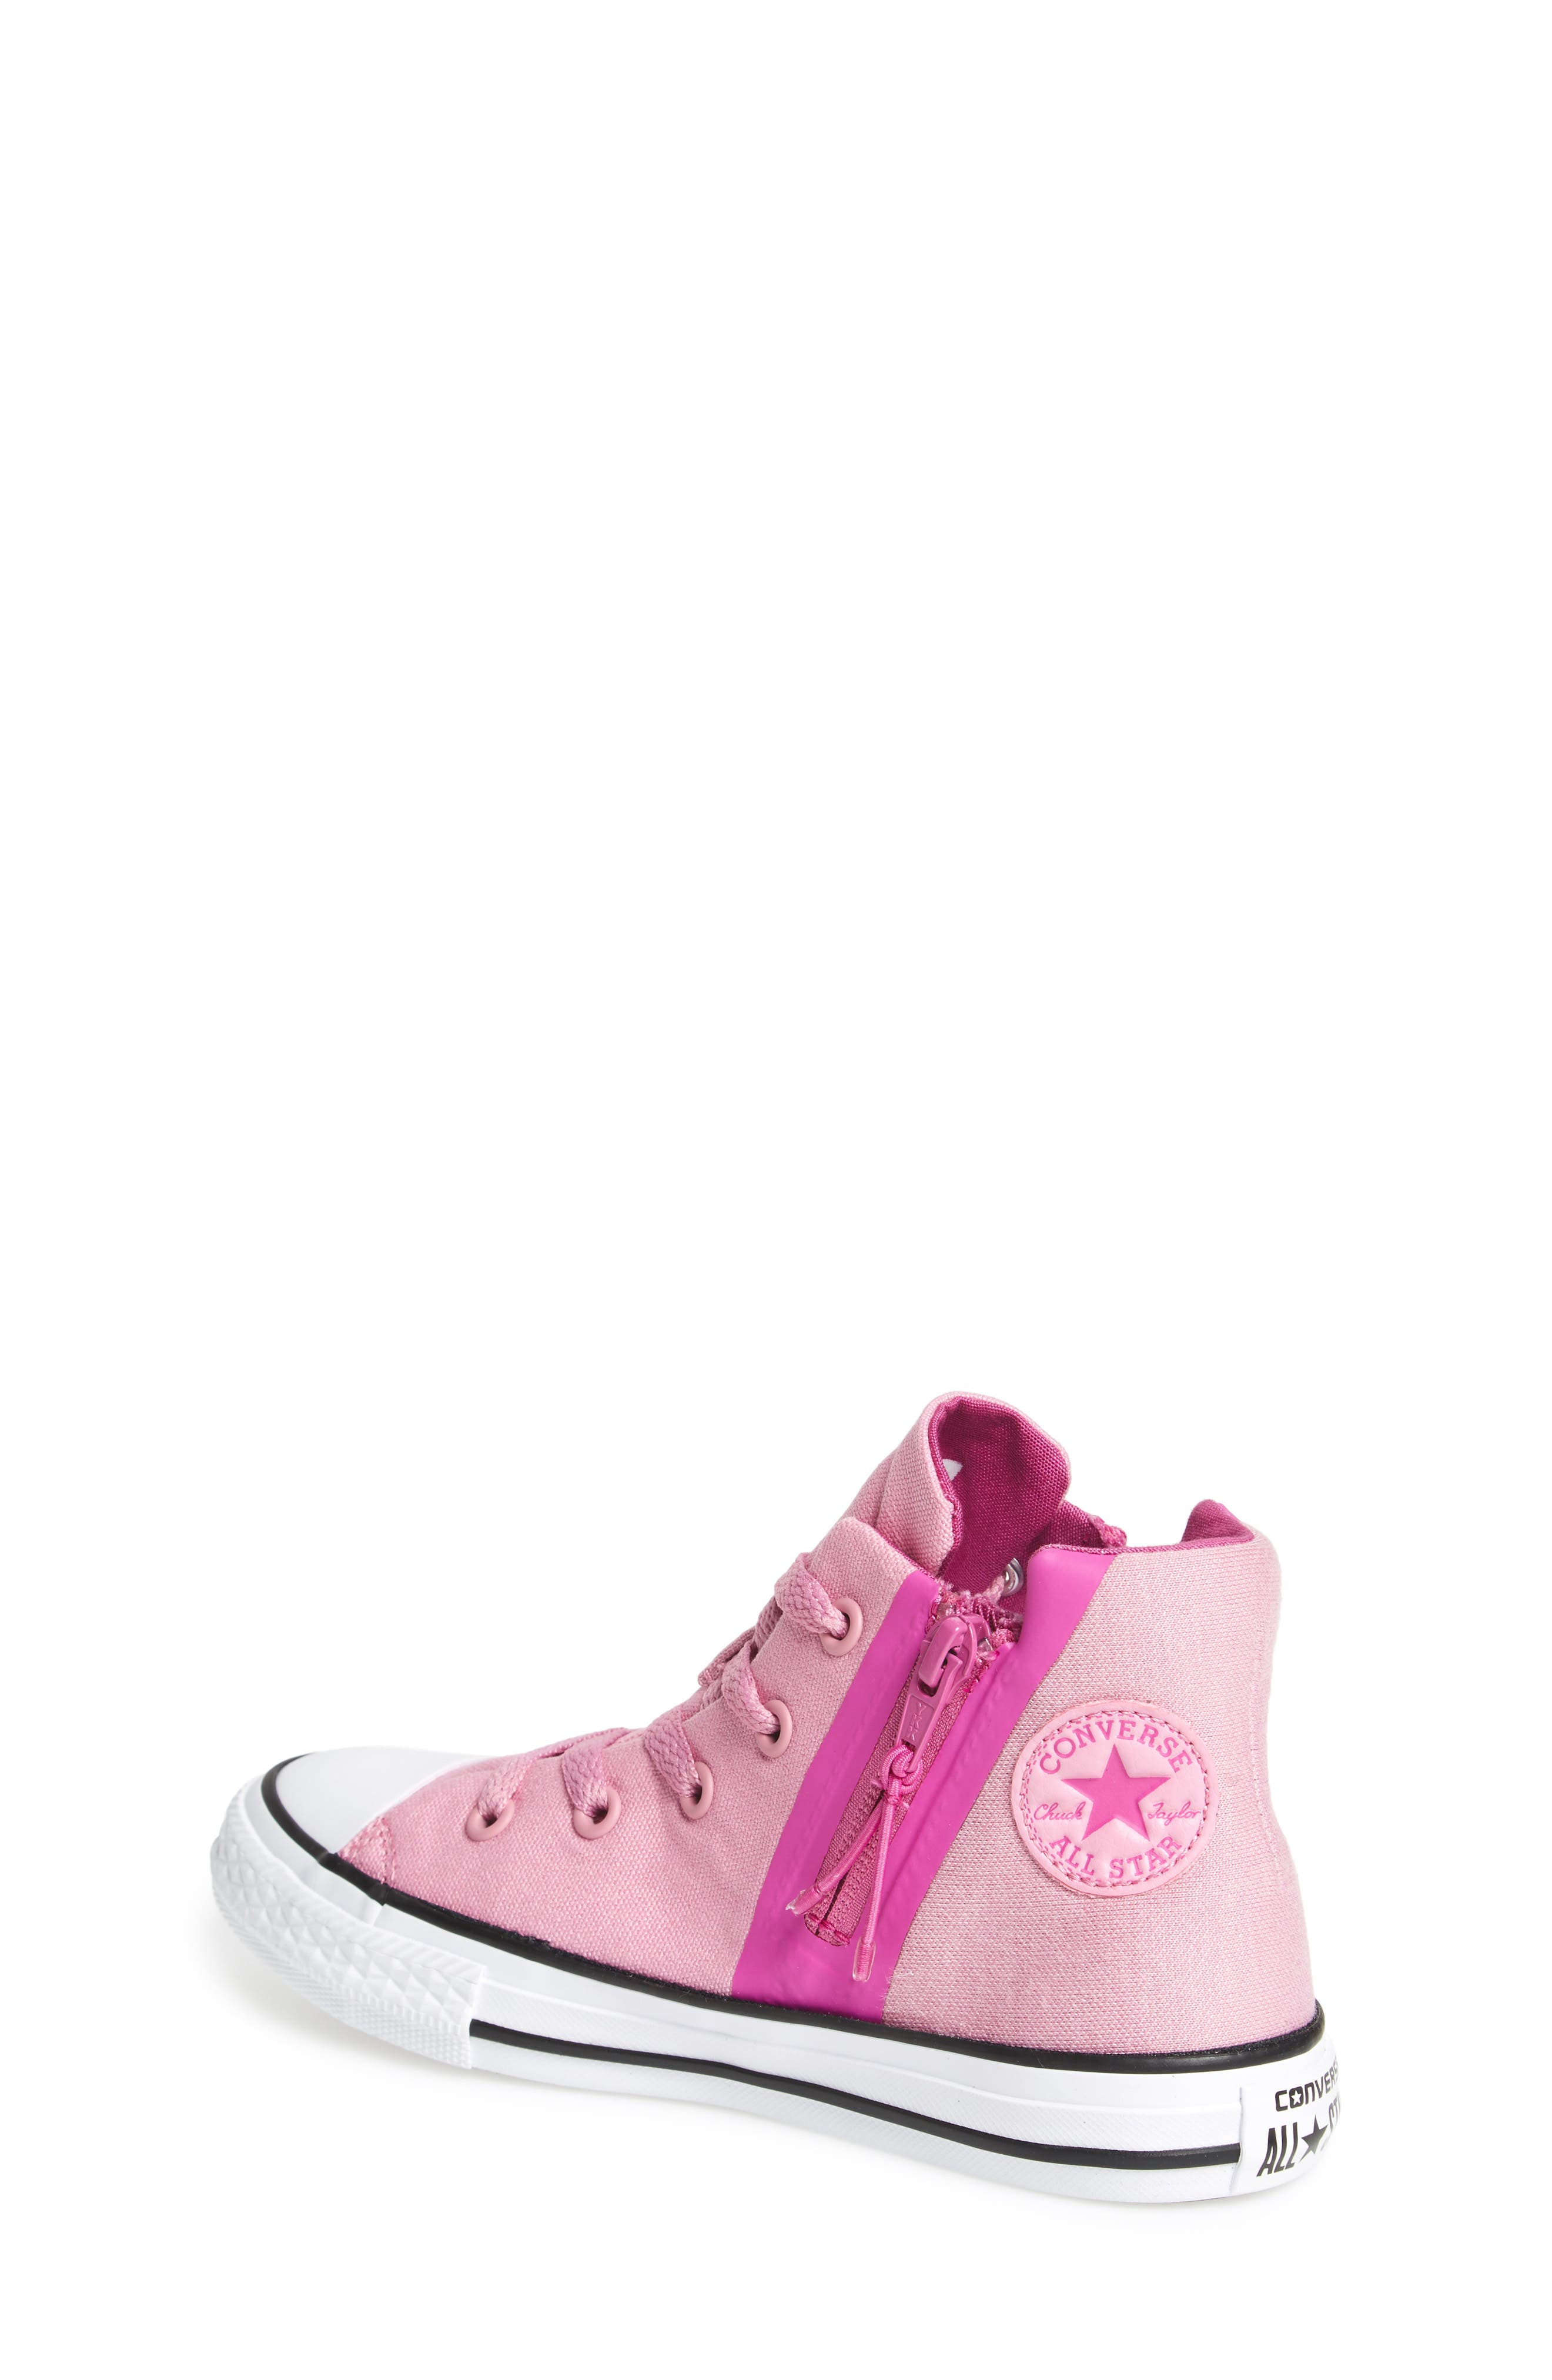 Alternate Image 2  - Converse Chuck Taylor® All Star® Sport Zip High Top Sneaker (Toddler, Little Kid & Big Kid)